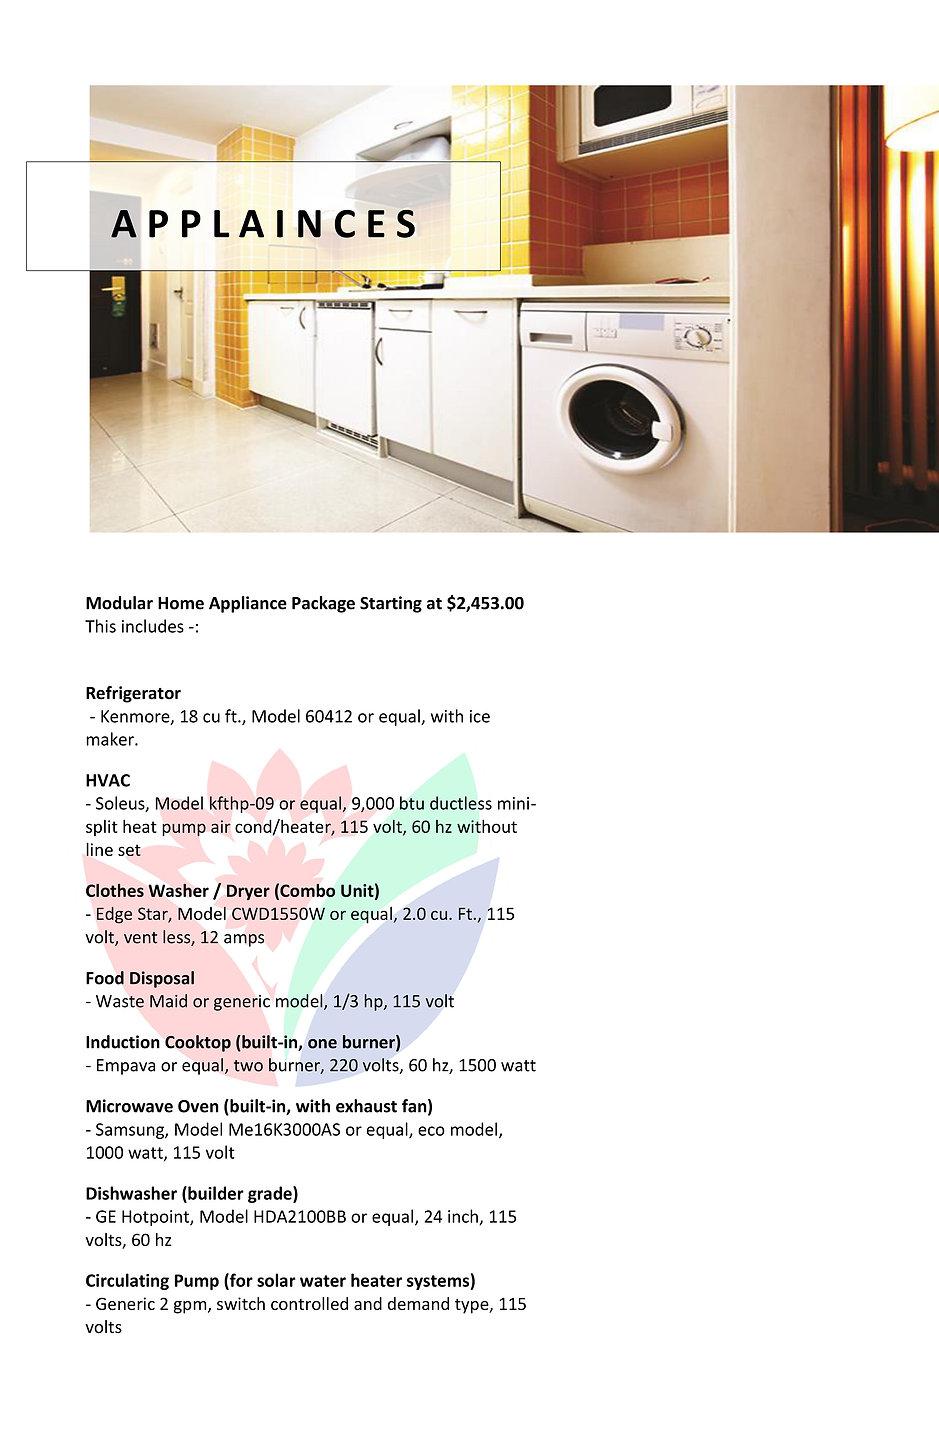 zeons | Appliances